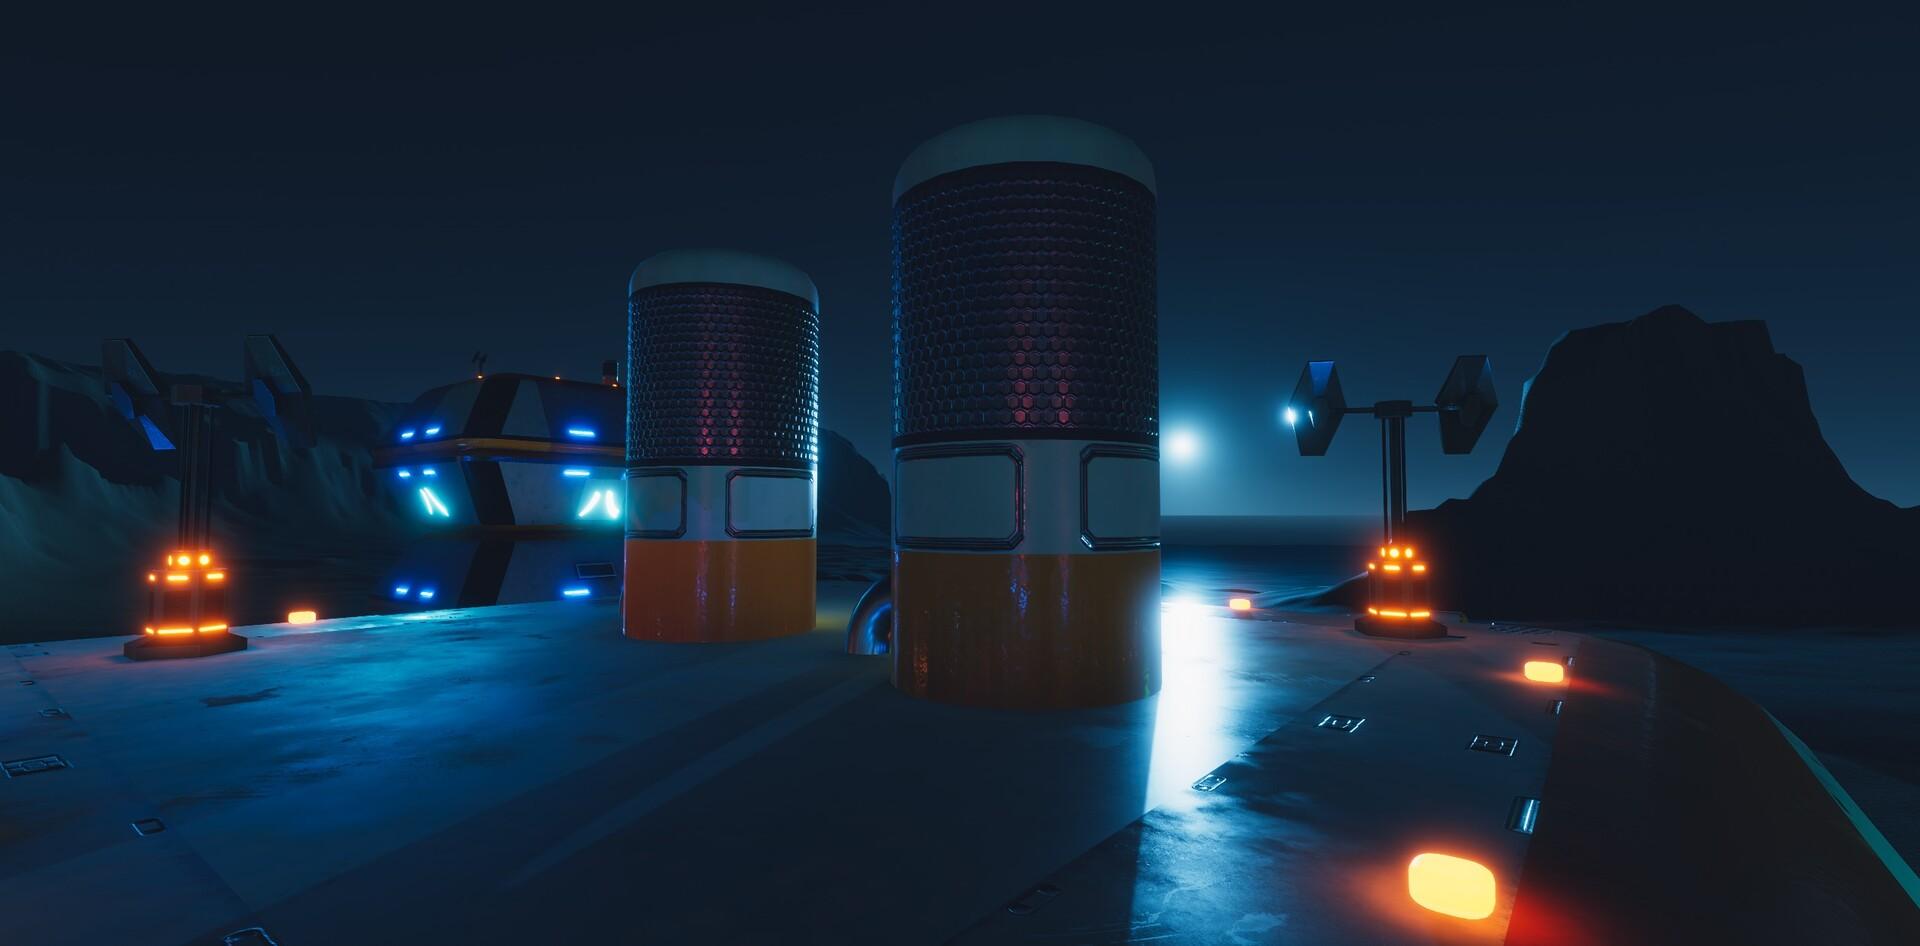 Enrico ottonello screenshot08 sci fi building exterior pack gameartifact